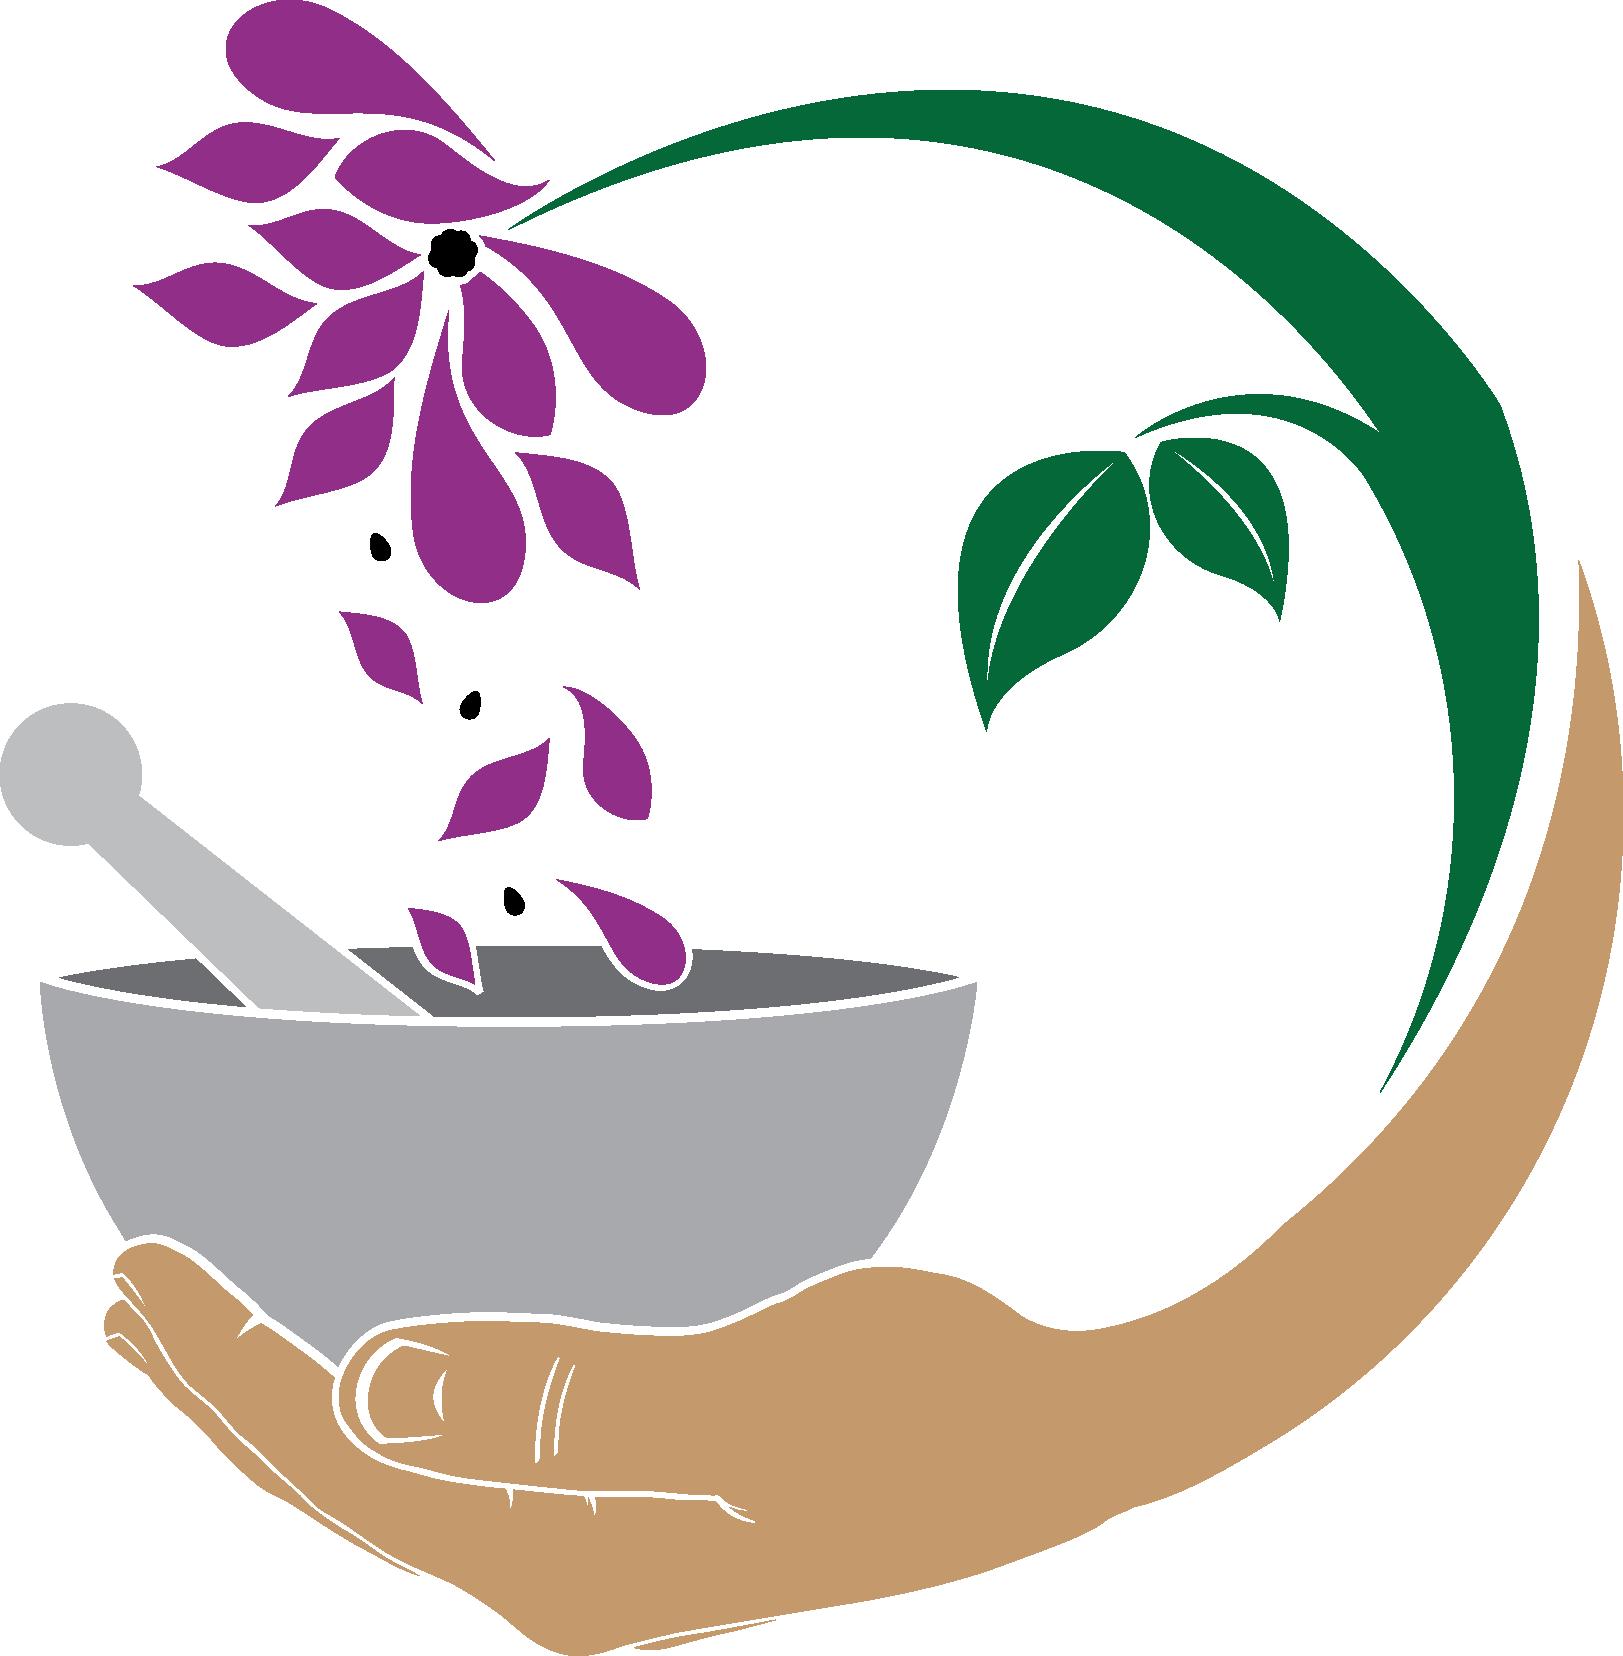 Sharing herbs a blog. Tea clipart medicinal herb